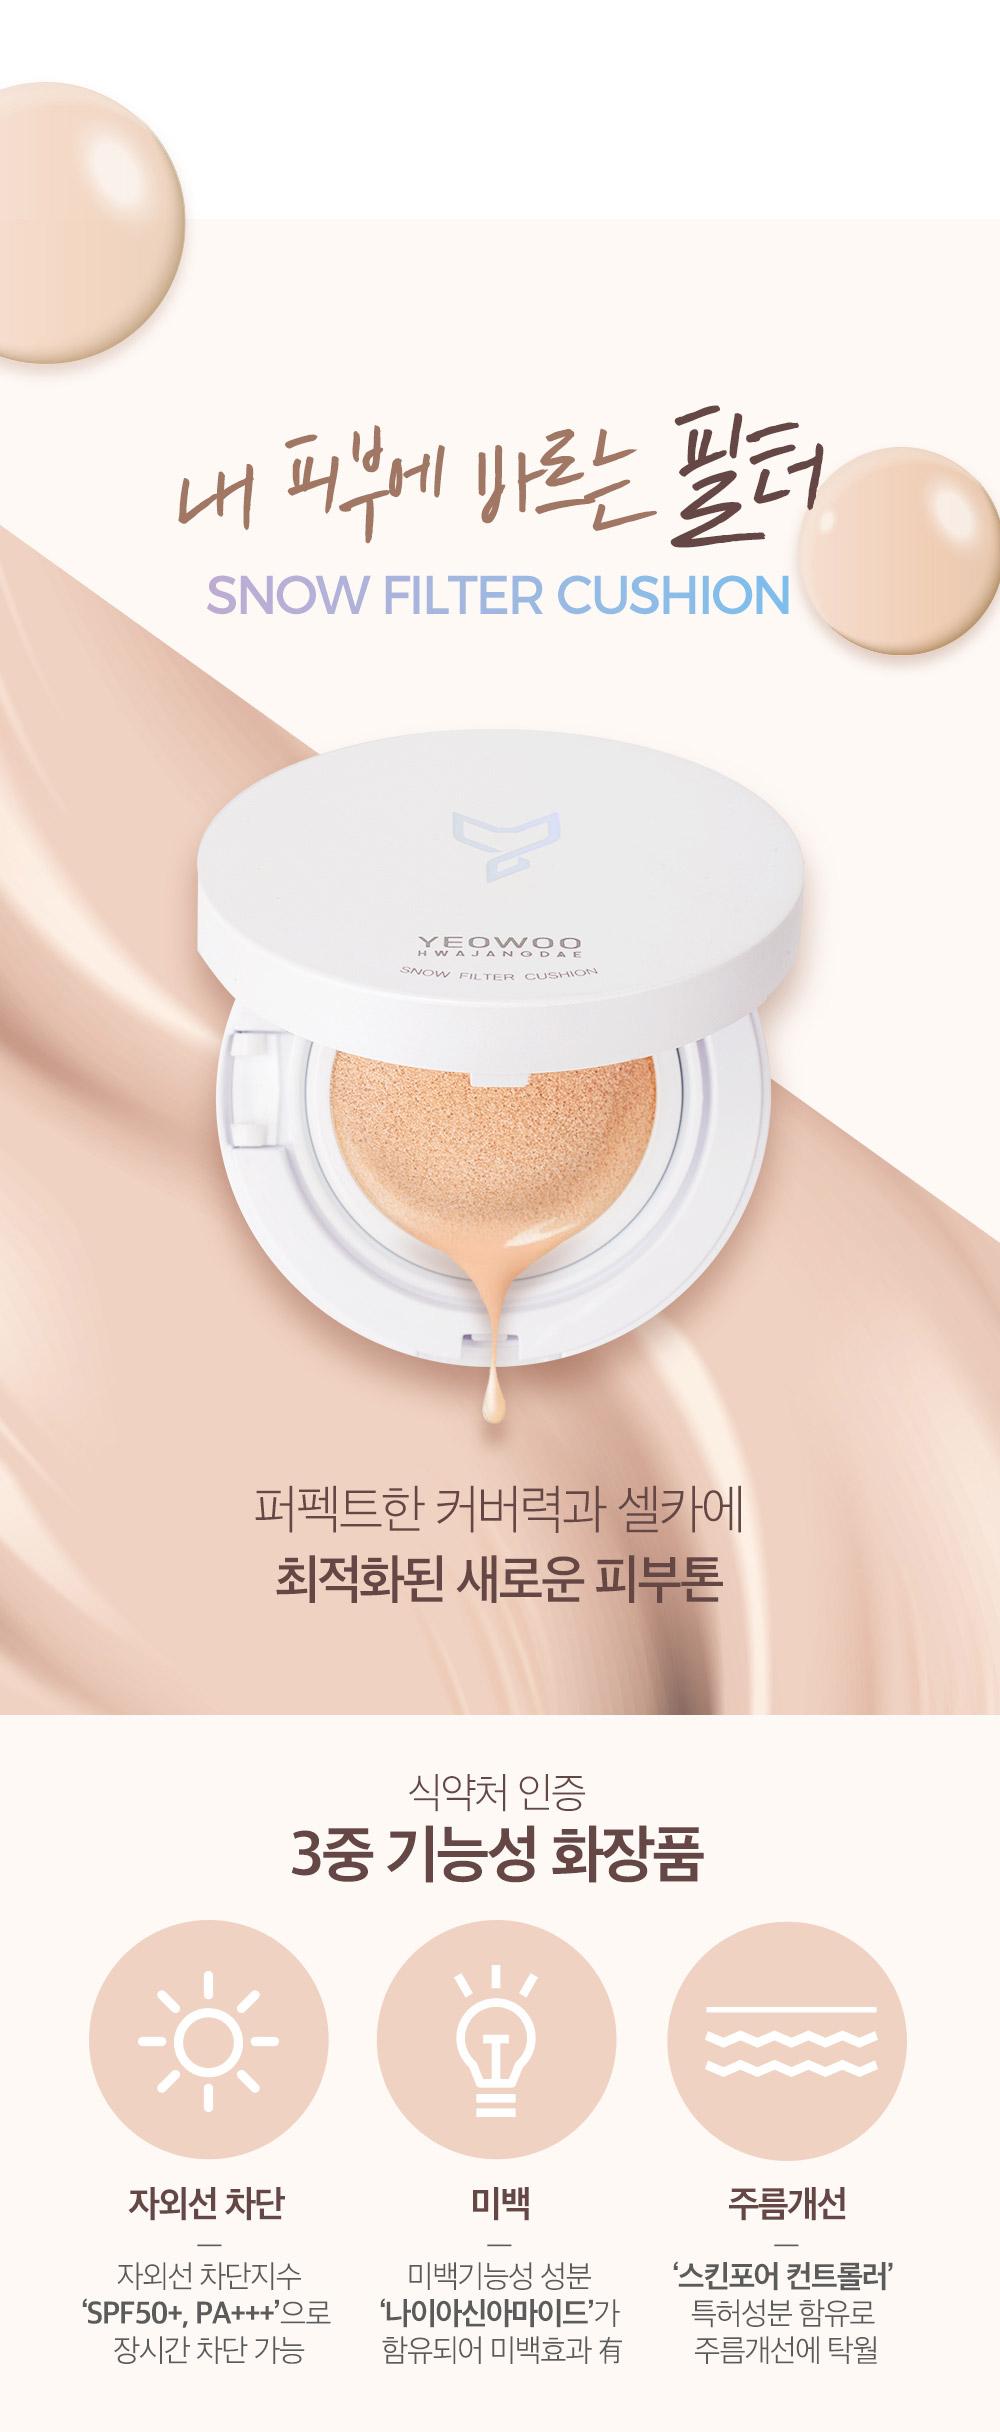 yeowoo-hwajangdae-snow-filter-cushion-15g-korean-cosmetic1.jpg